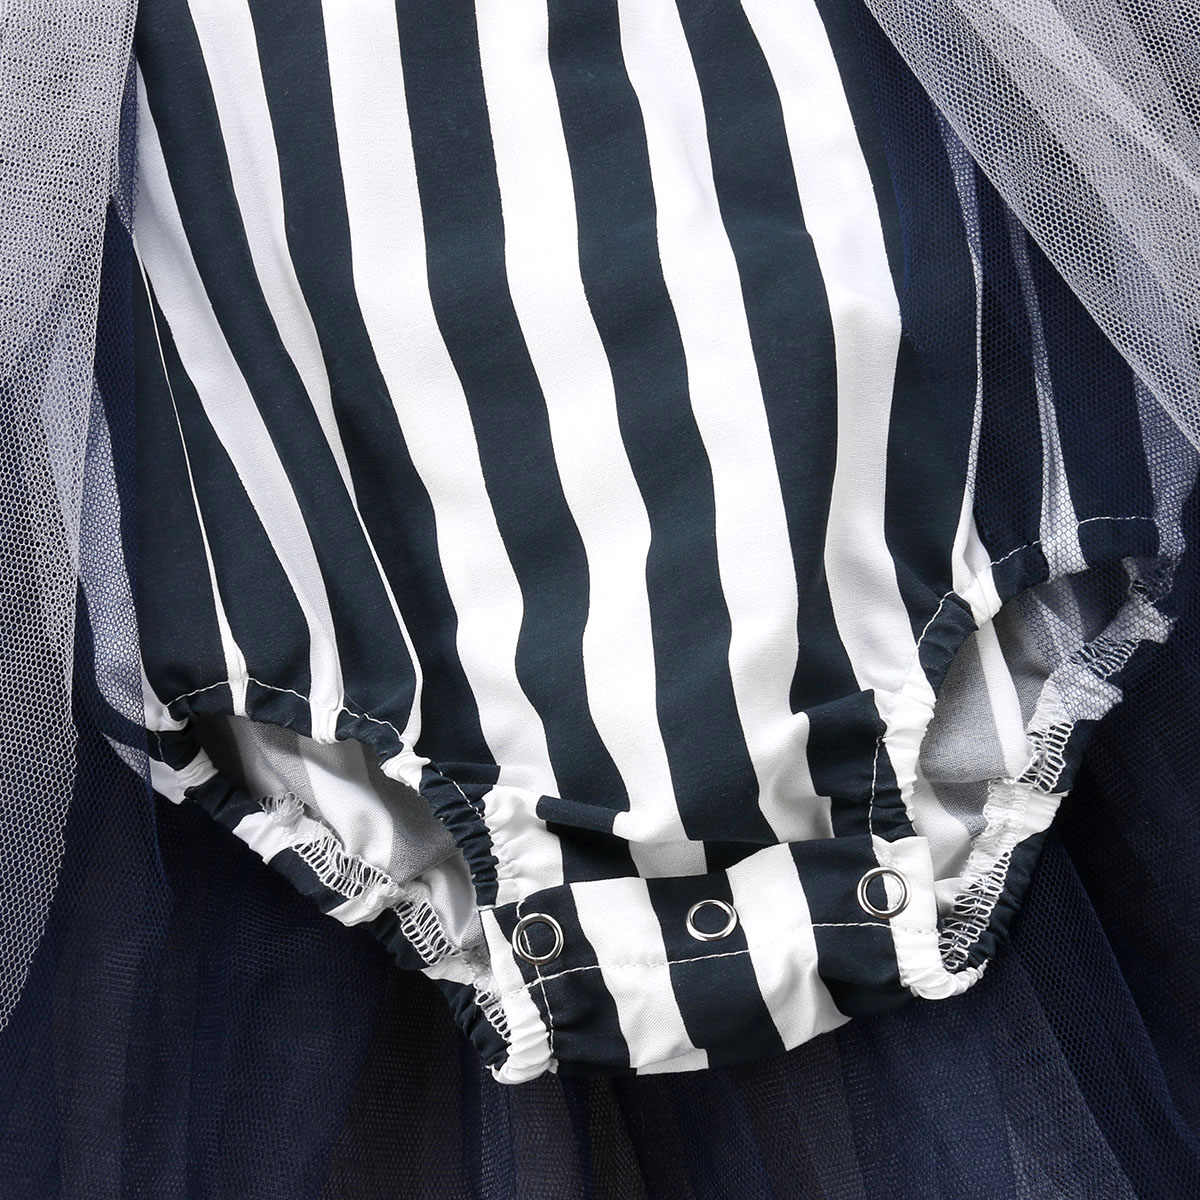 2018 Pasgeboren Peuter Baby Meisje Halloween Zwarte Bodysuit Gestreepte Tutu Rok Jumpsuit Playsuit Leuke Vakantie Kleding 0-24 m 45